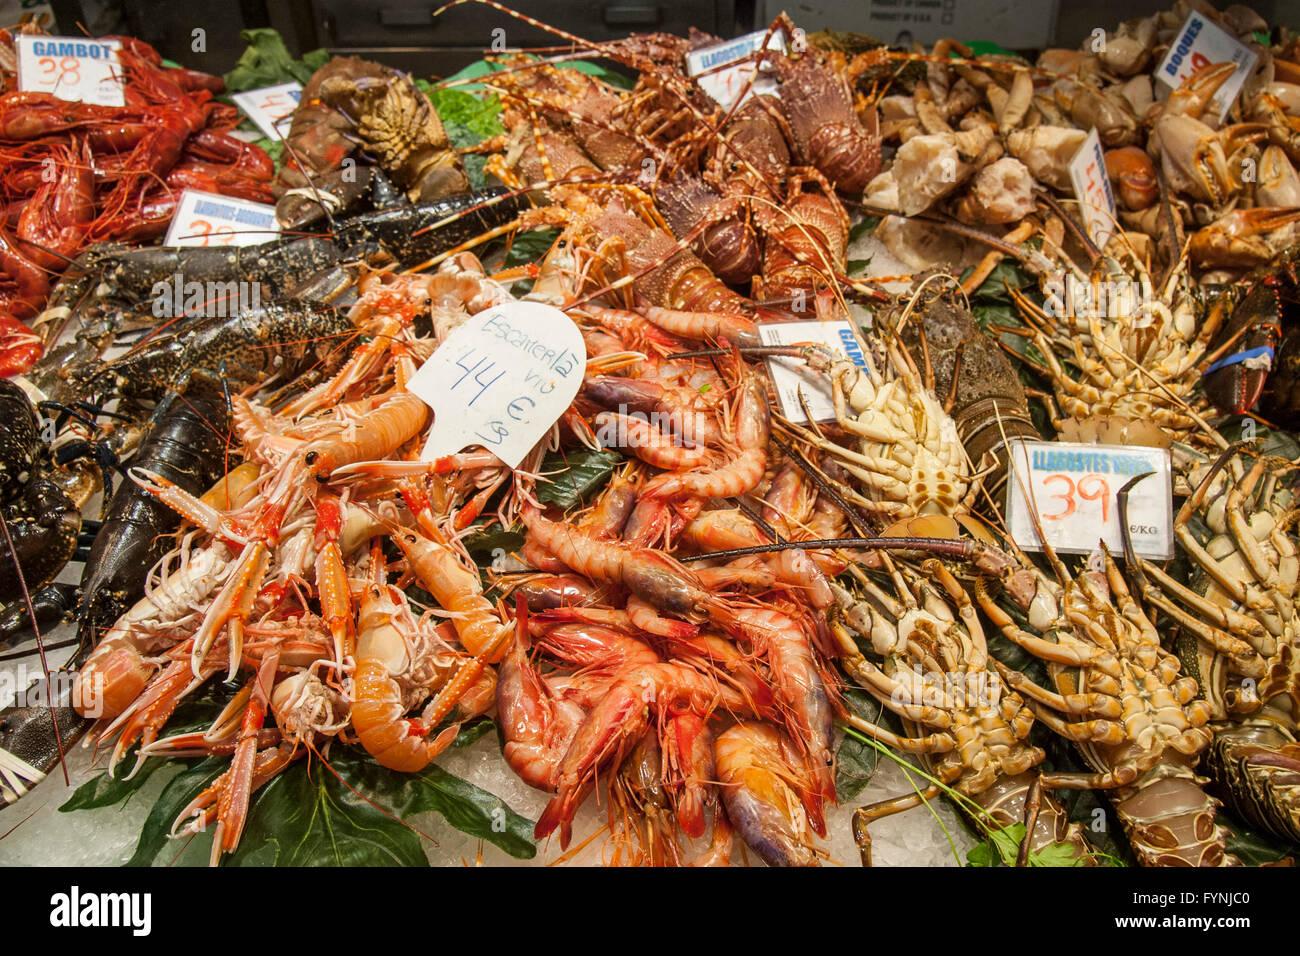 Seafood fish mercat de sant josep located on la rambla for La fish market